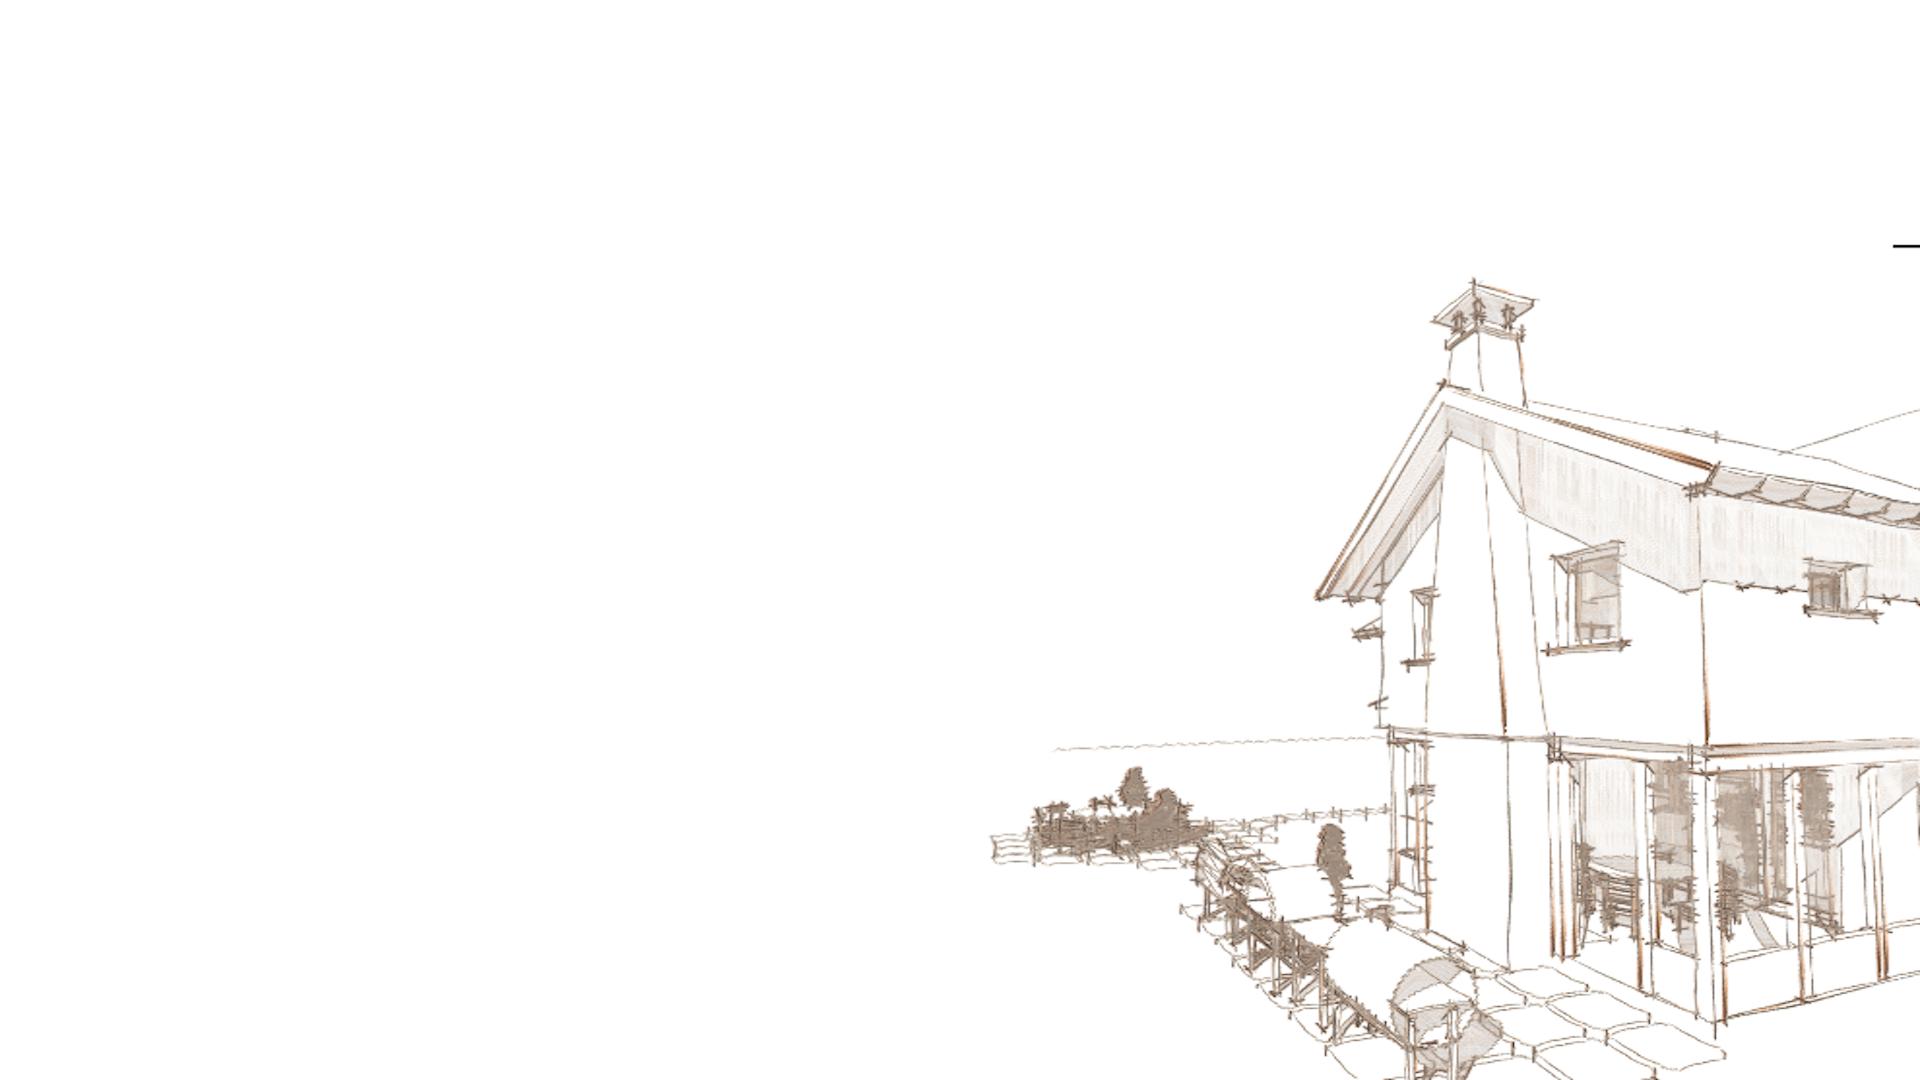 zimtor architecture LLC